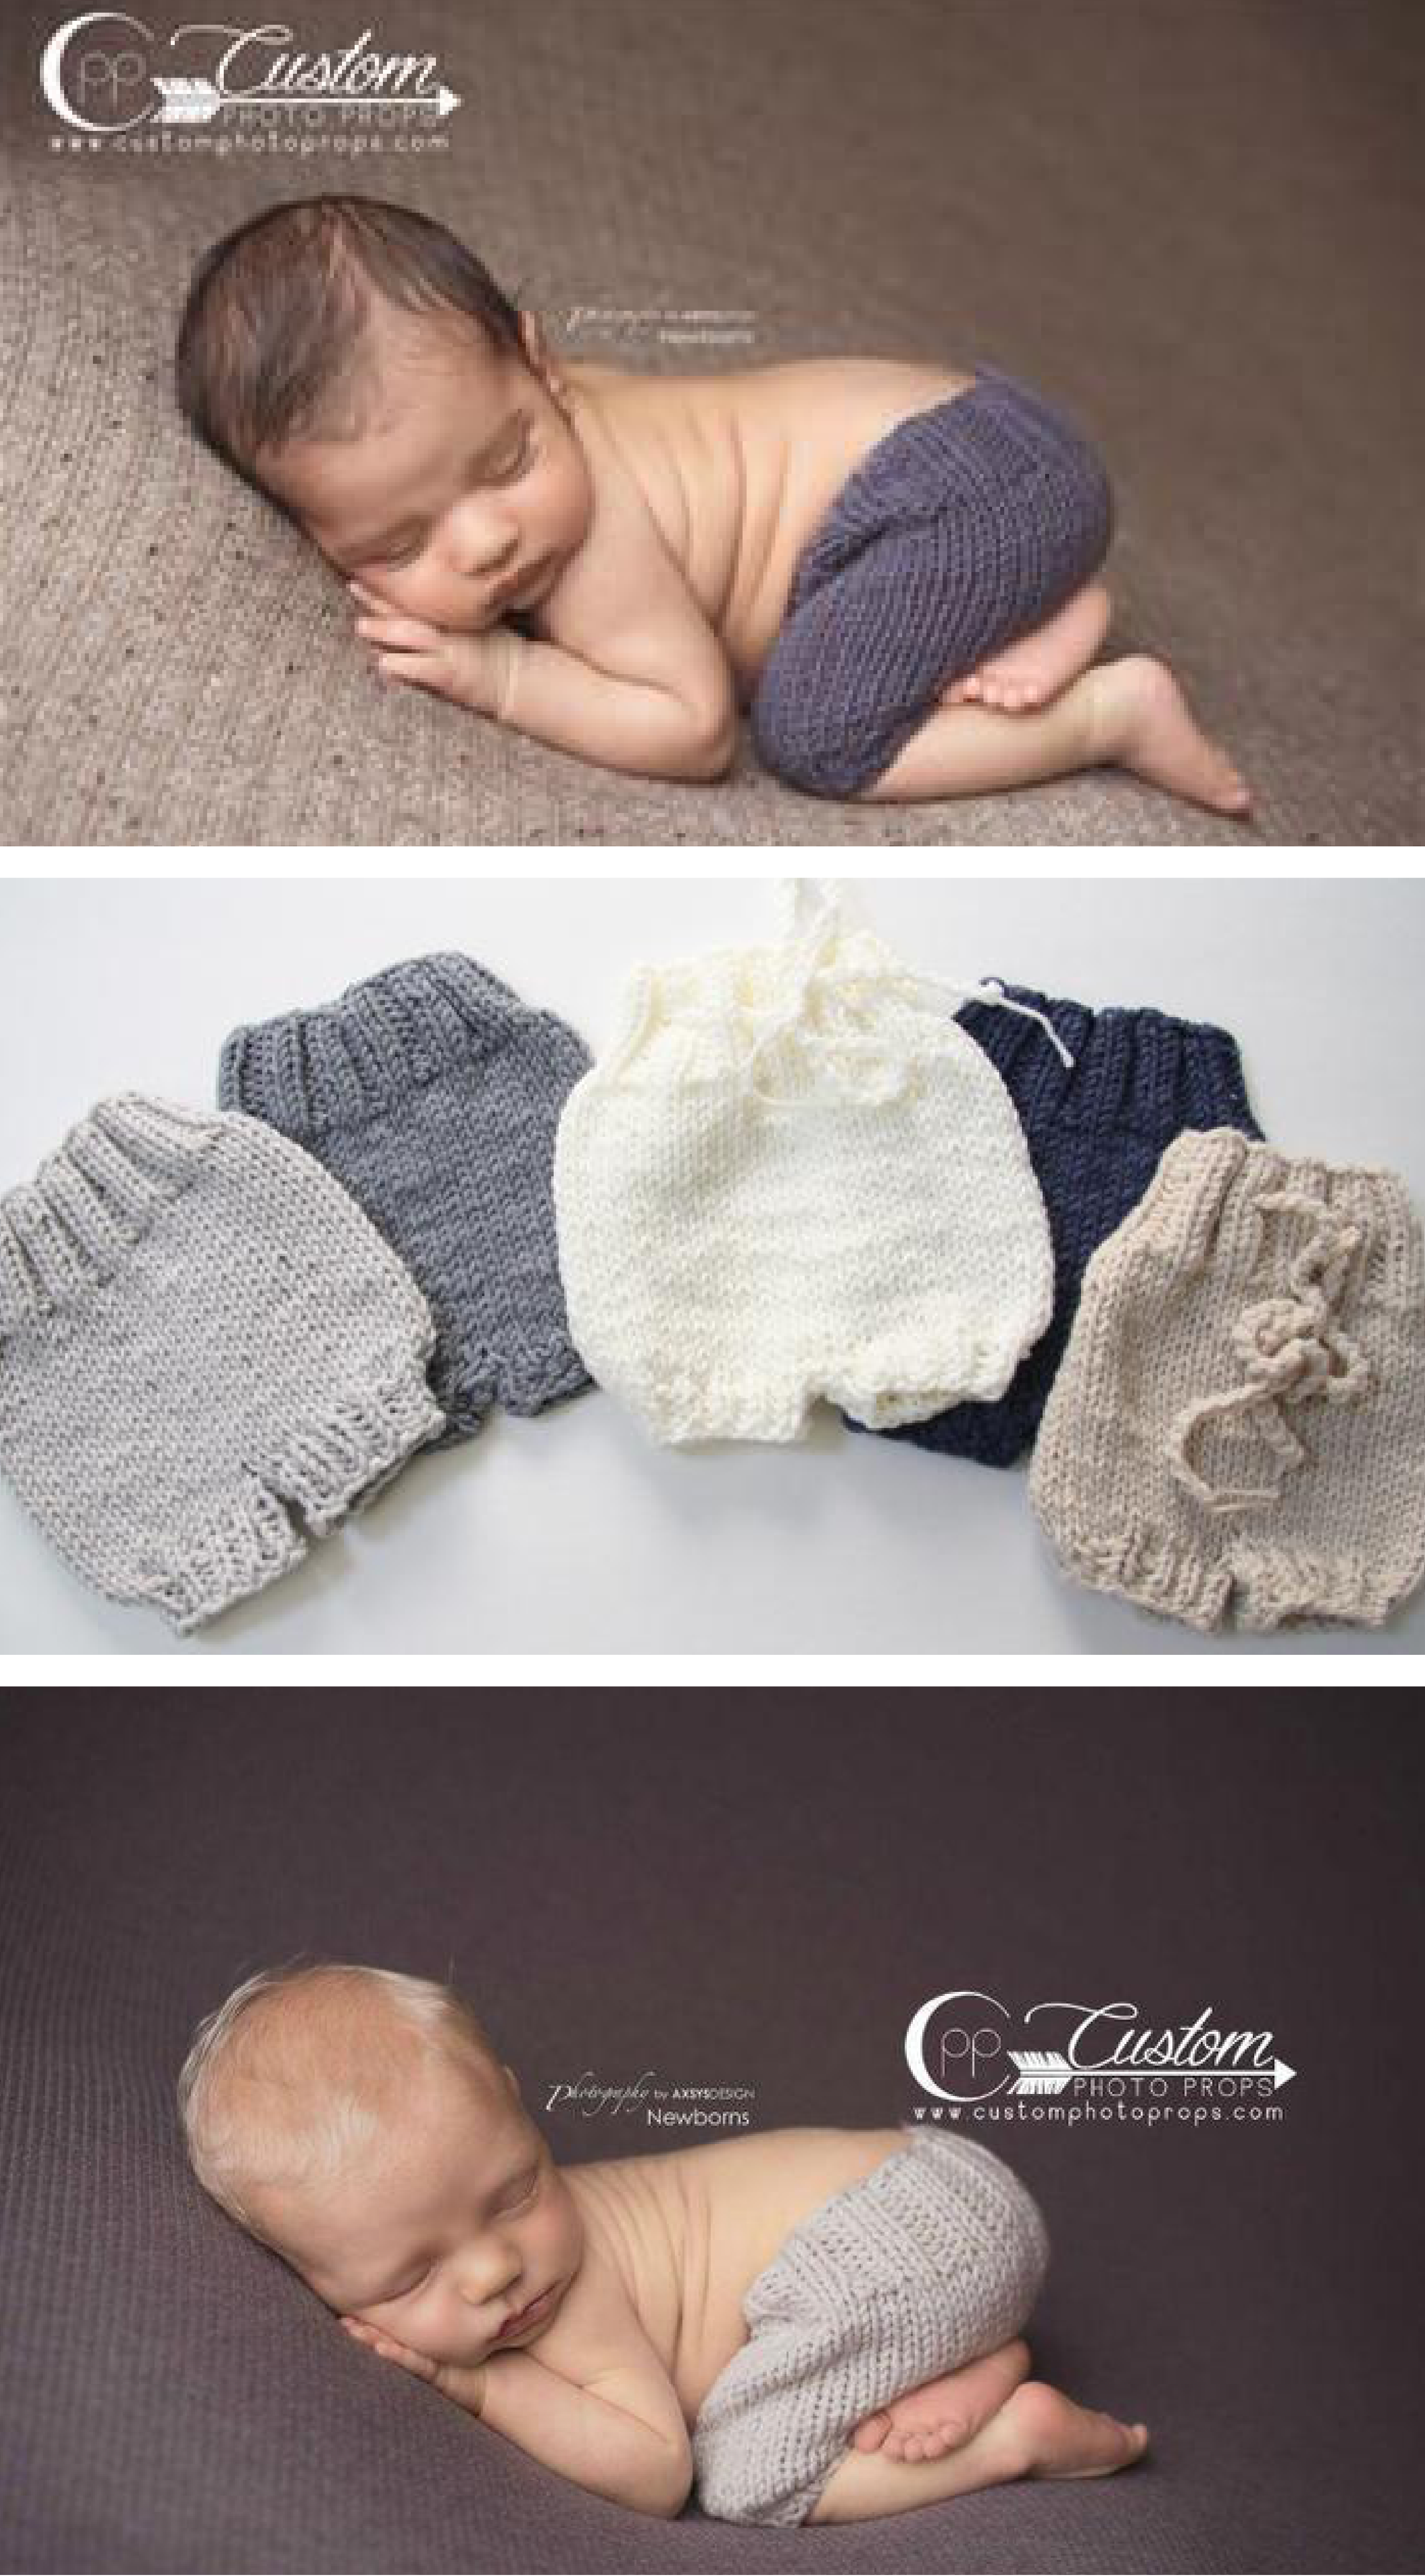 newborn photography prop photo baby photo prop blue baby gift HANDMADE NEWBORN SHORT set grey striped baby hat striped stretch knit